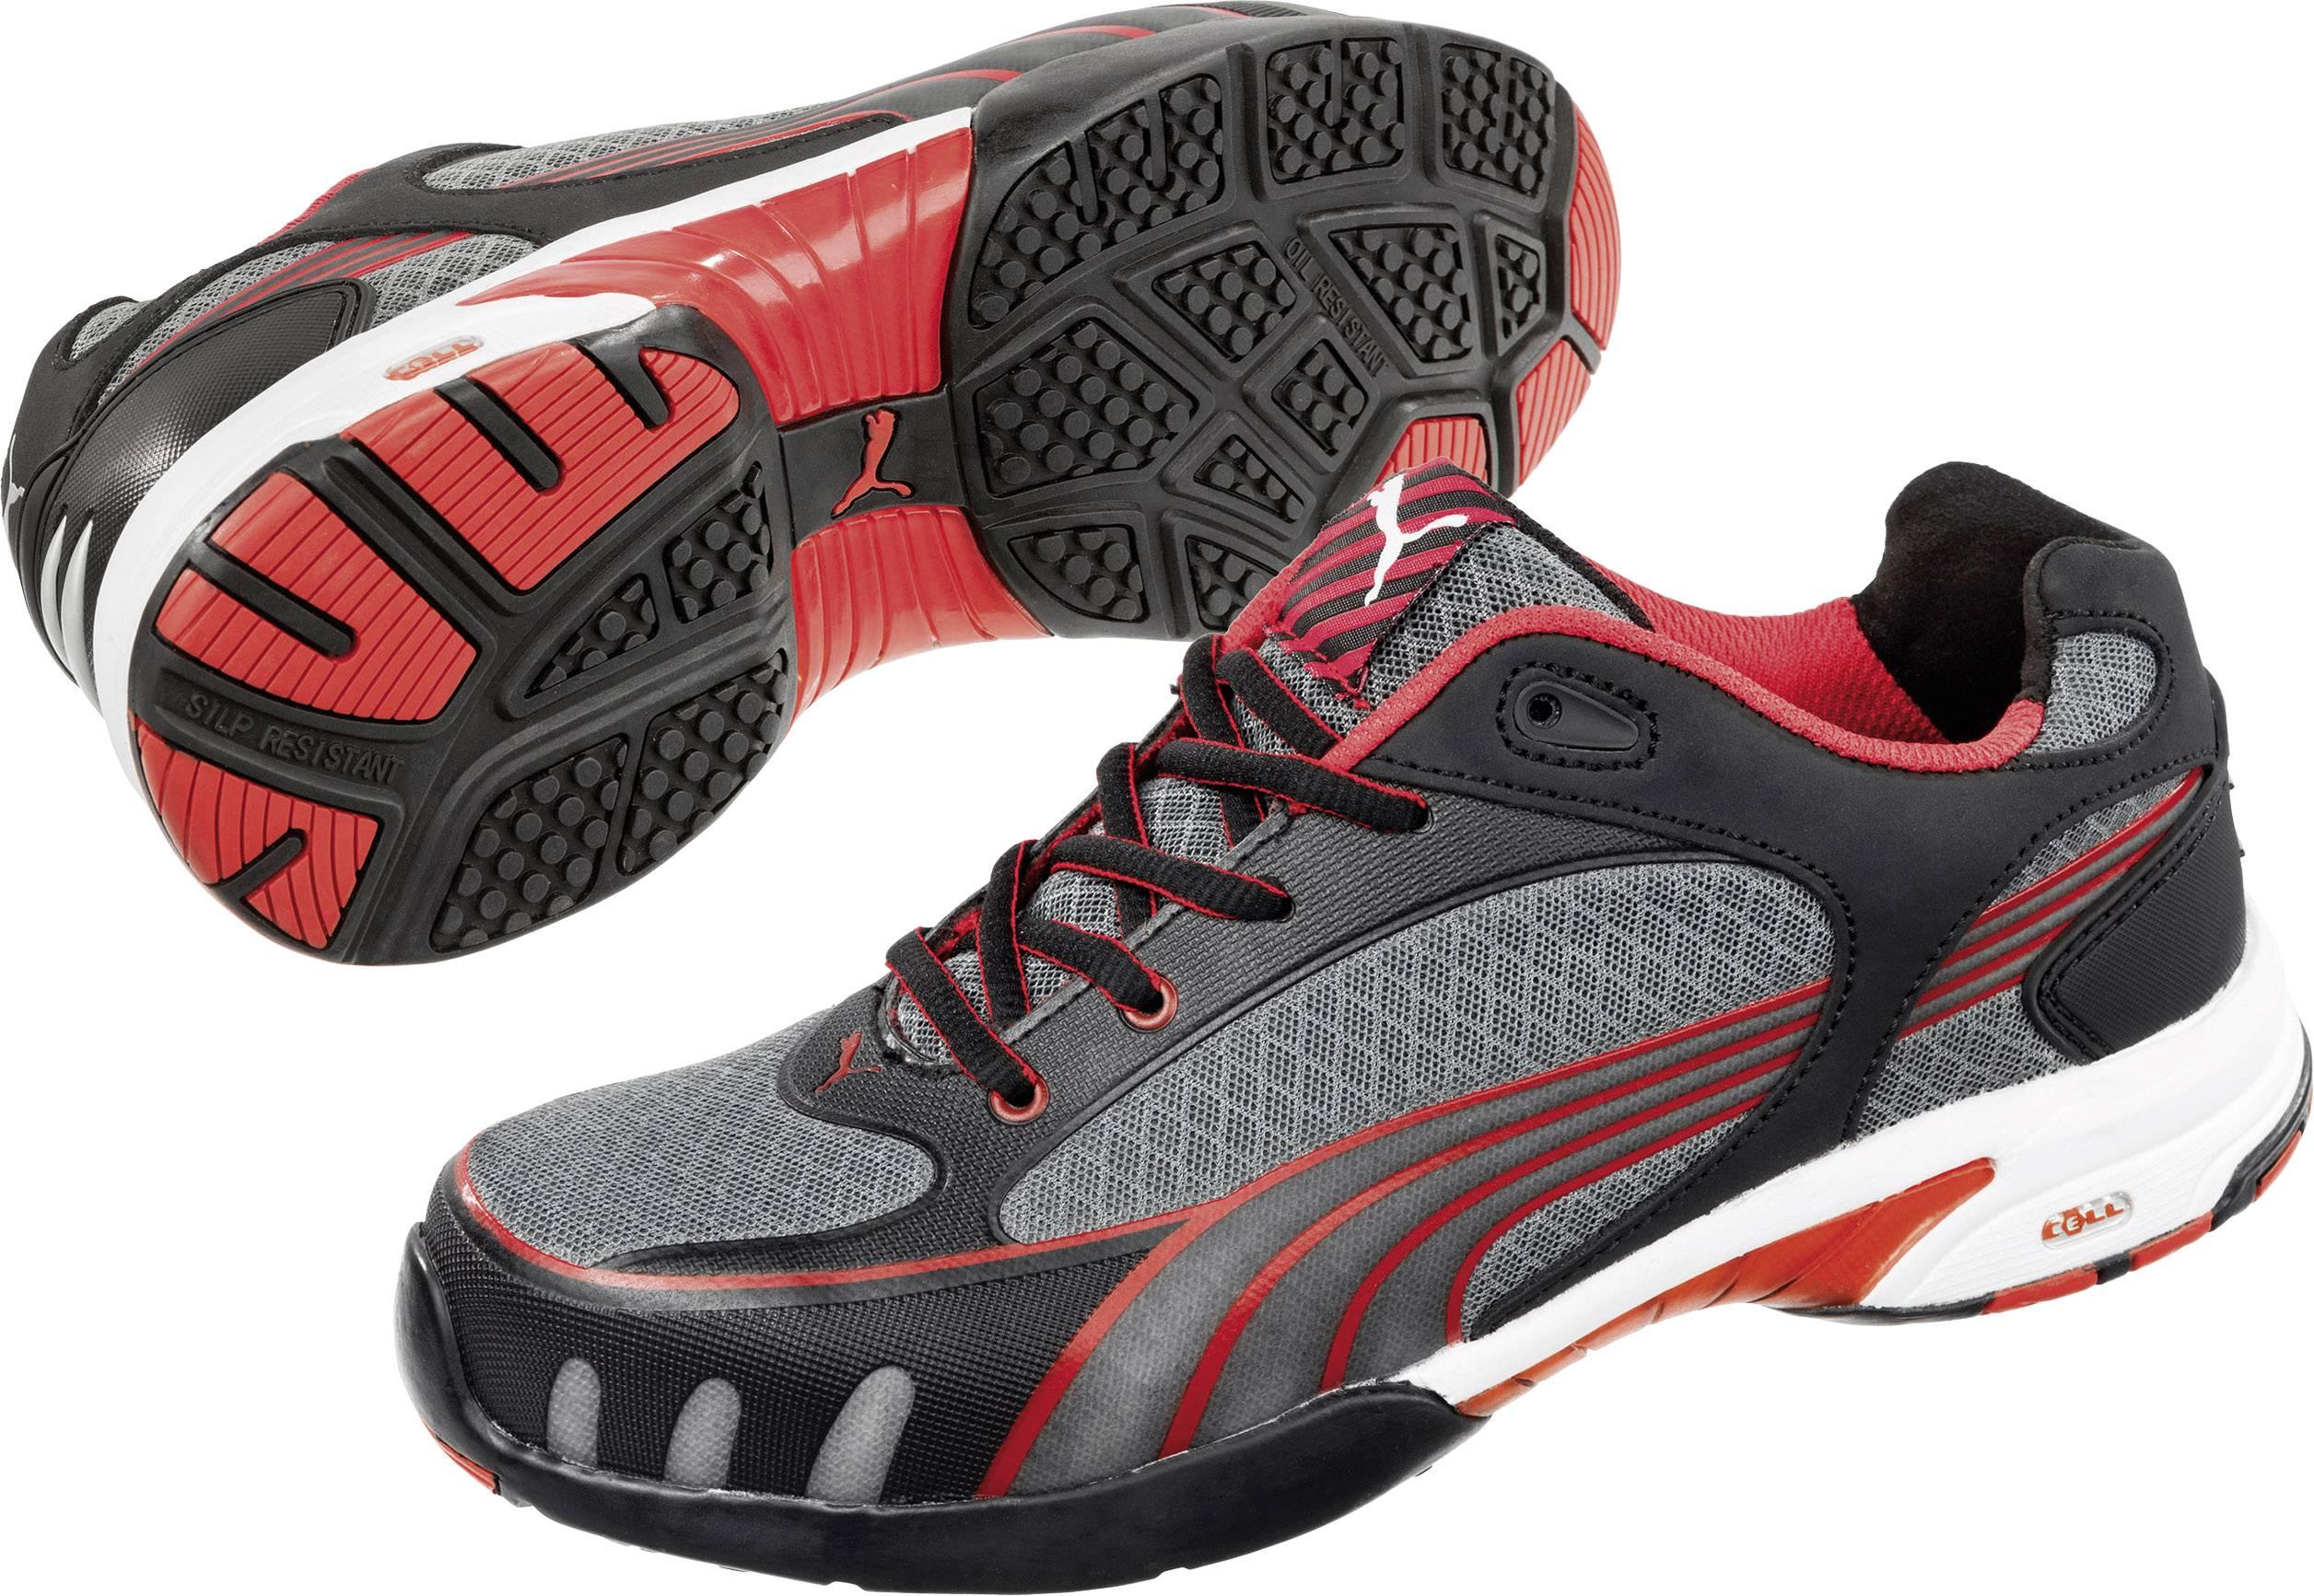 Bezpečnostná obuv S1 PUMA Safety Fuse Motion Red Wns Low 642870, veľ.: 40, čierna, červená, 1 pár